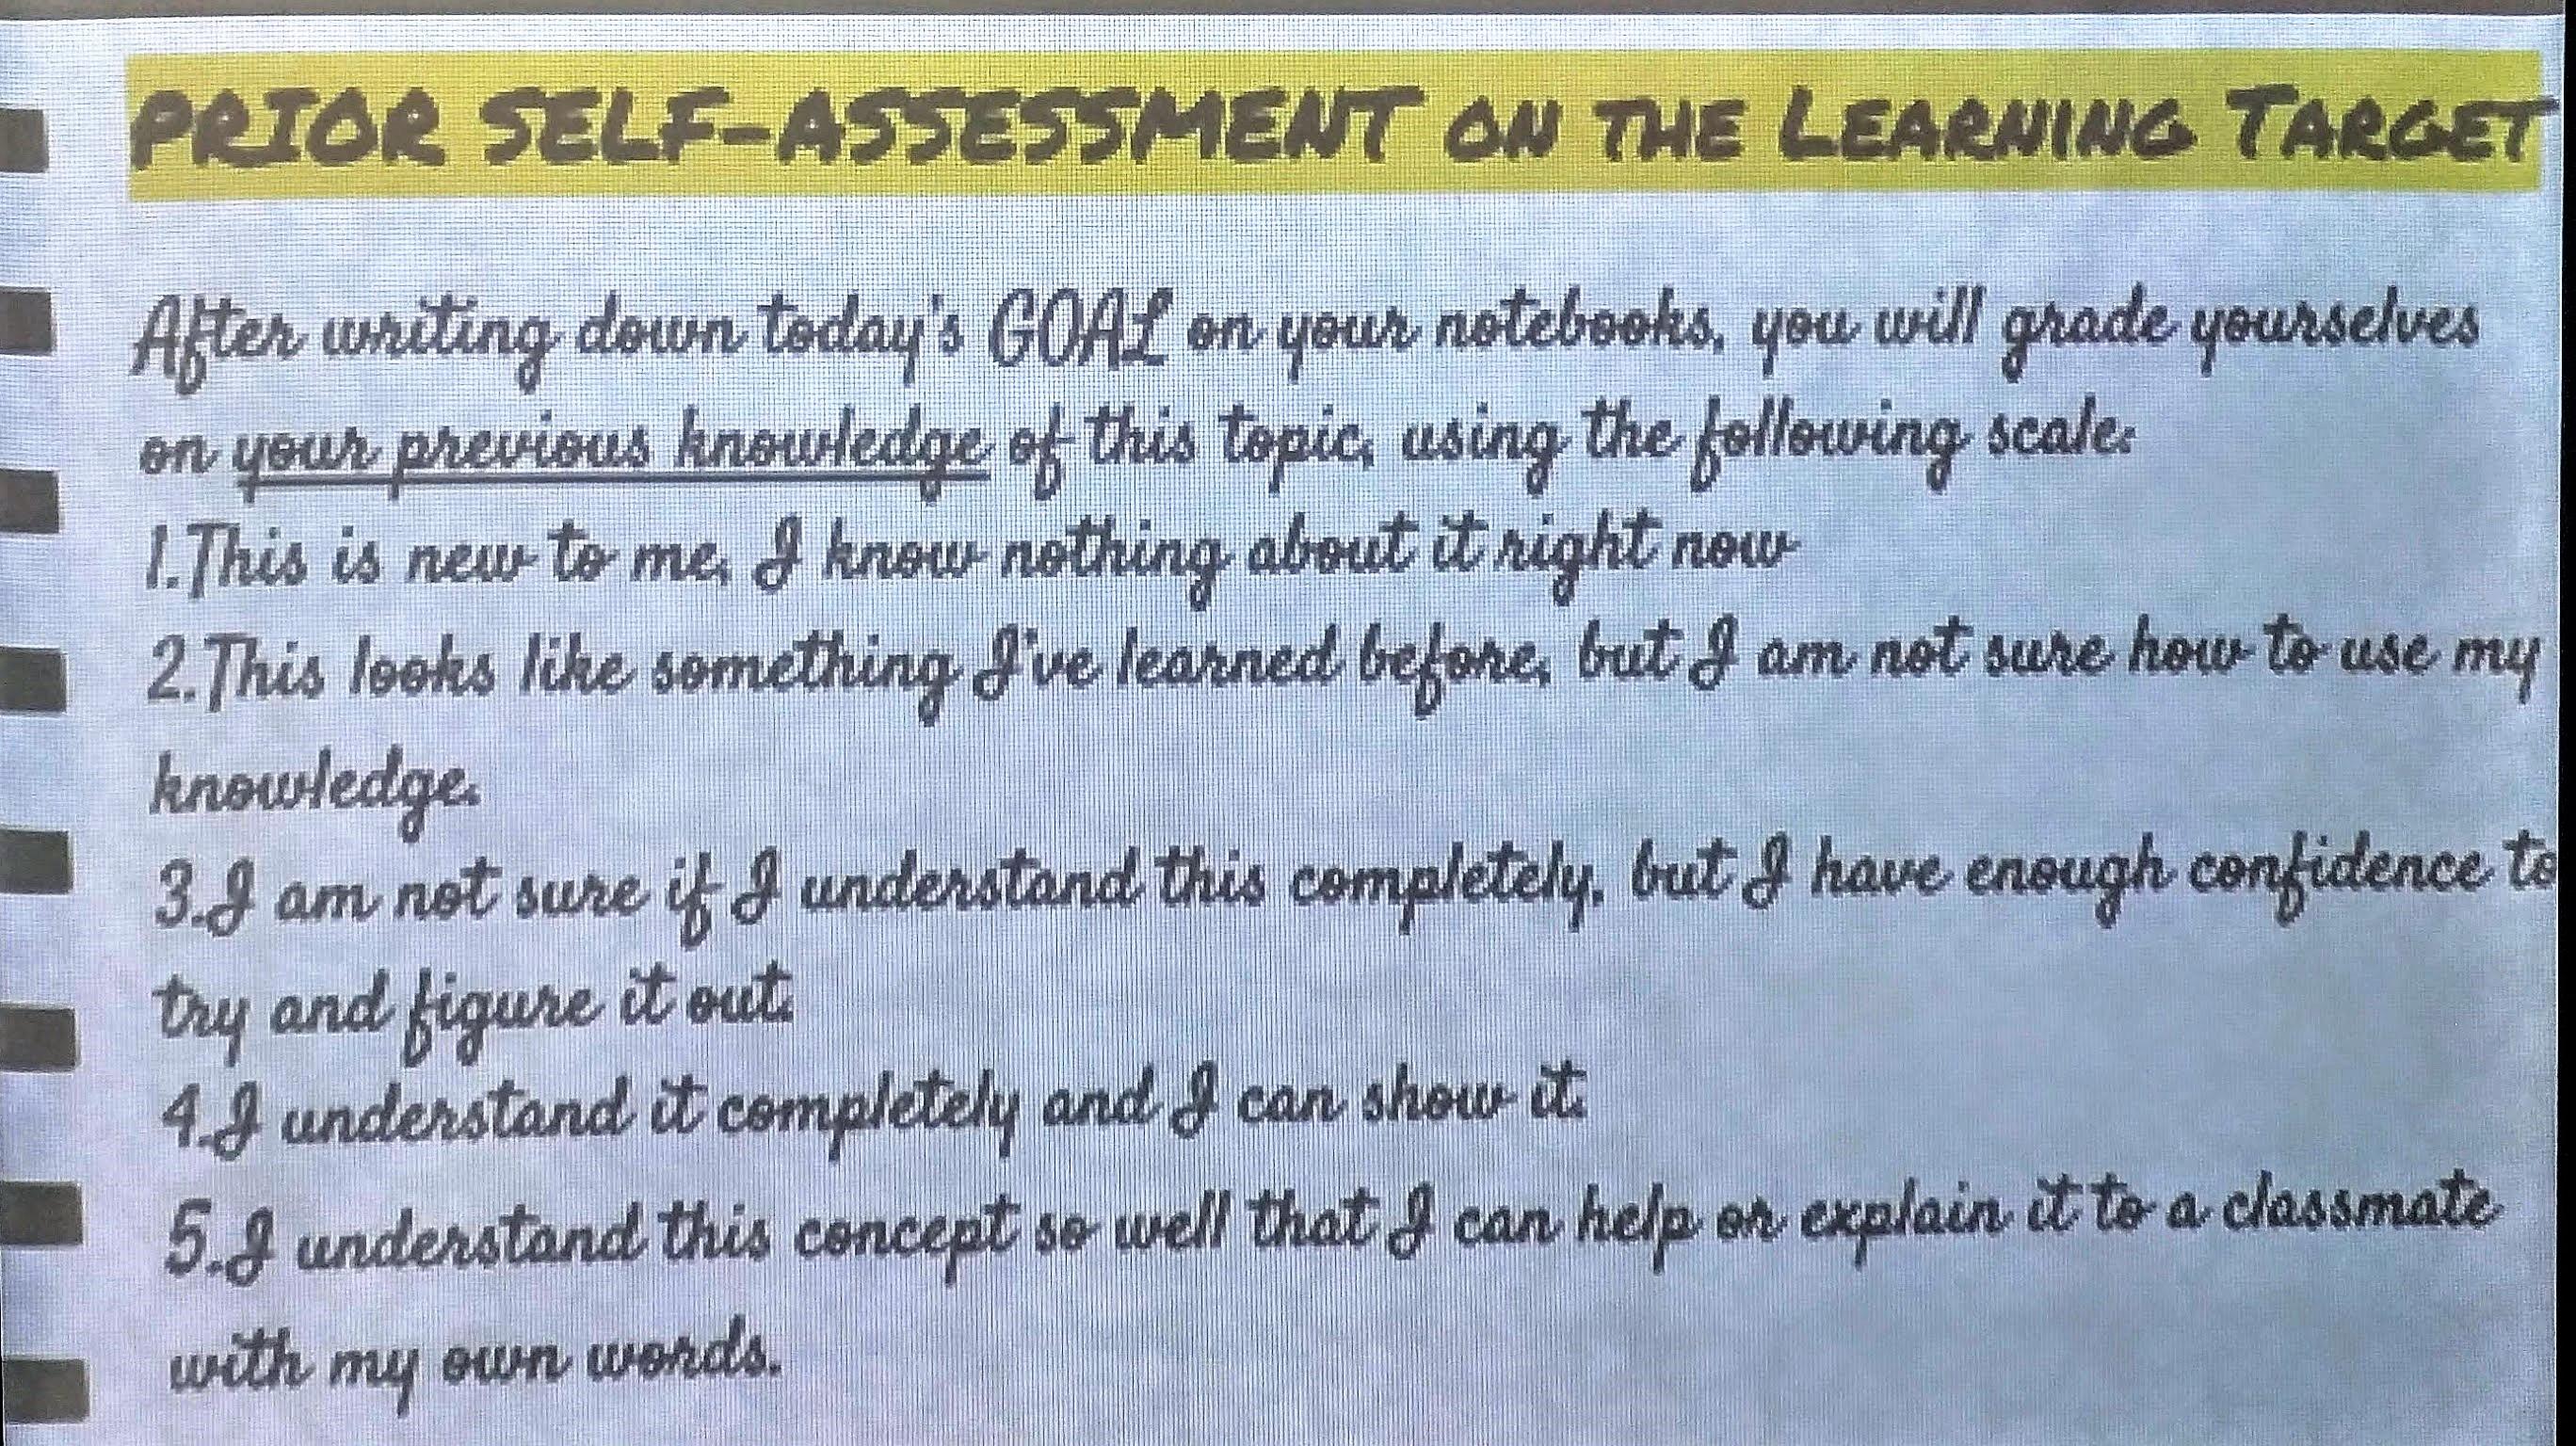 Uworld Step 2 Self Assessment 2 Answers